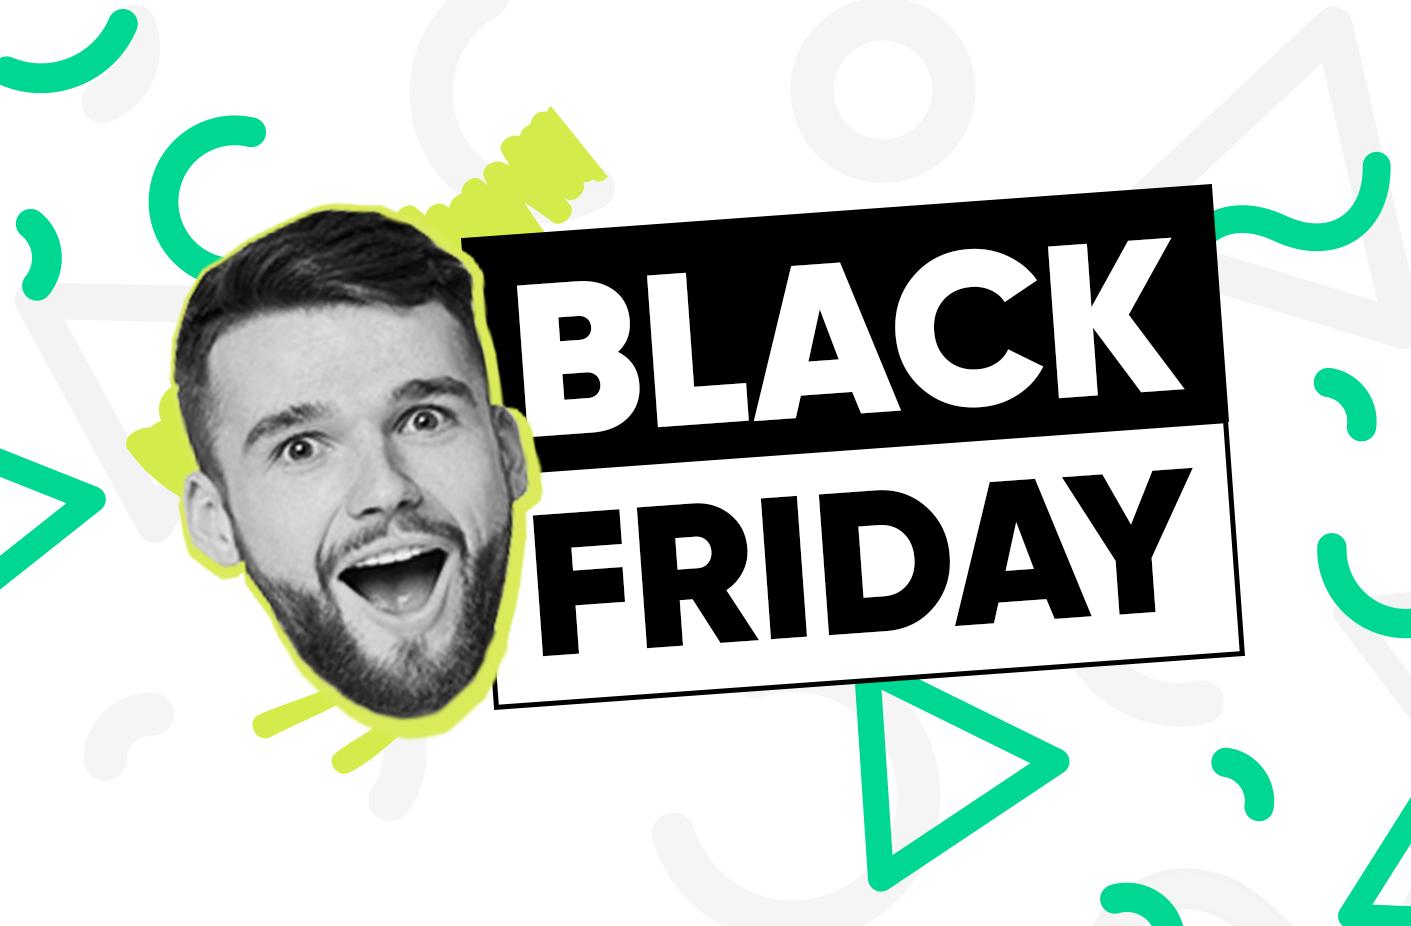 Vem aí: Temporada Black Friday 2019